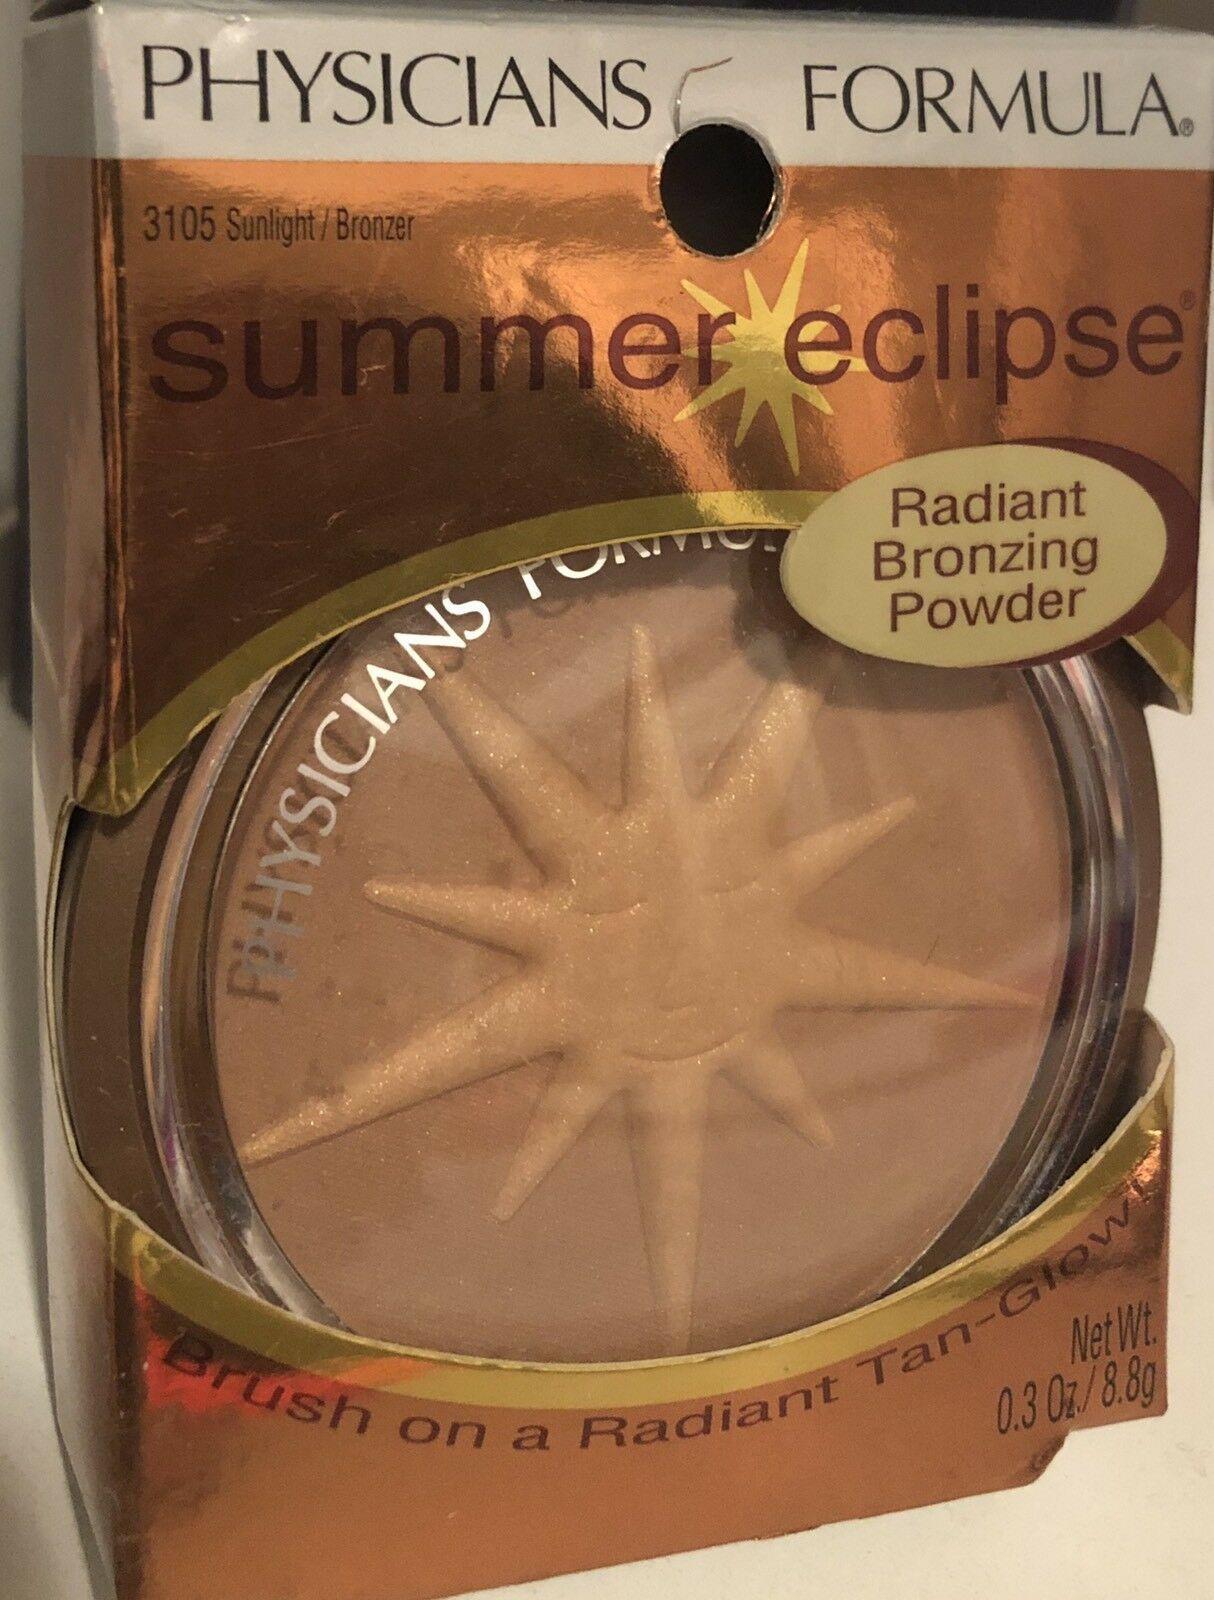 Physicians Formula Summer Eclipse Radiant Bronzing Powder Sunlight Bonzer - 3105 - $13.99